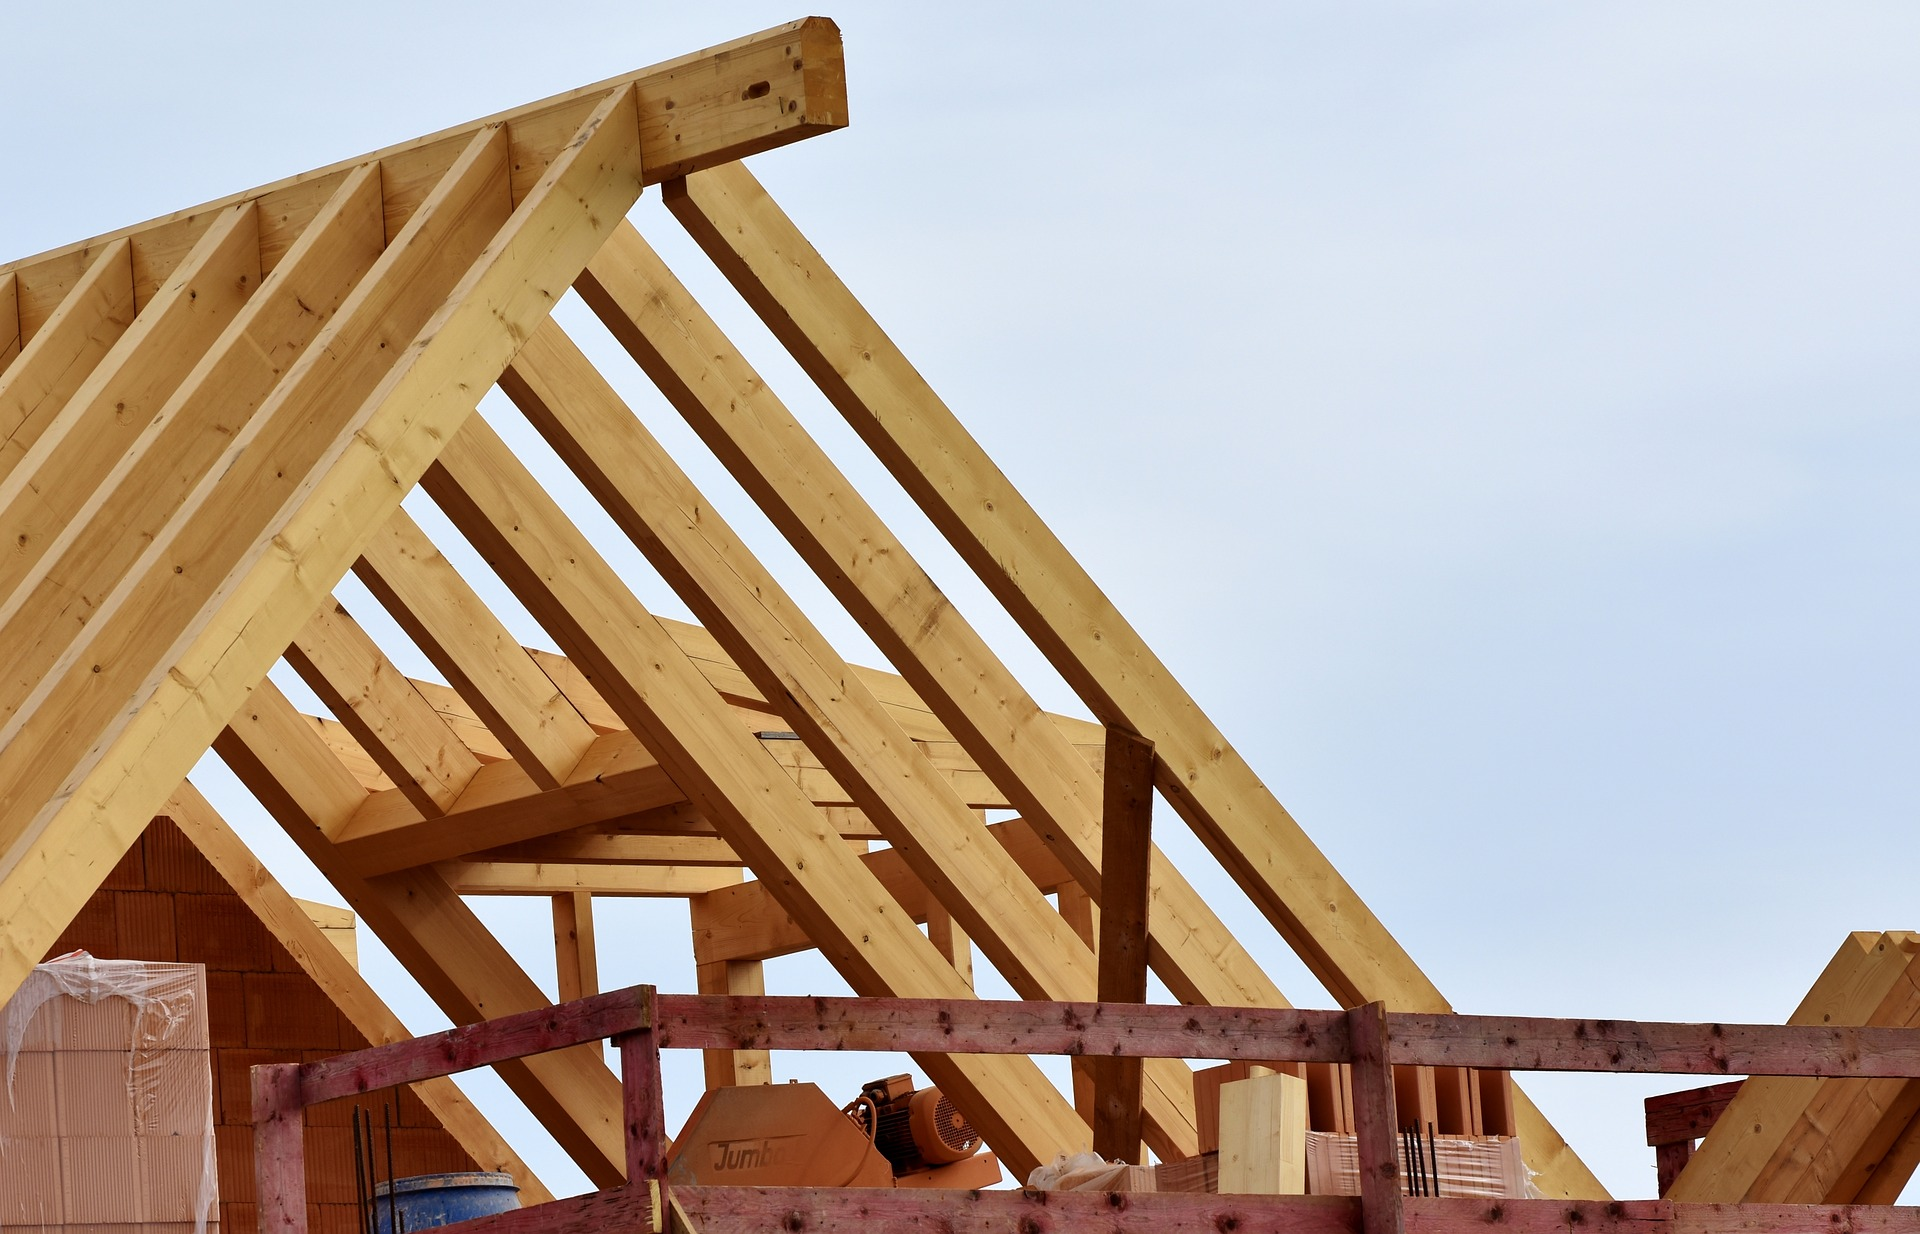 roof truss 3339206 1920